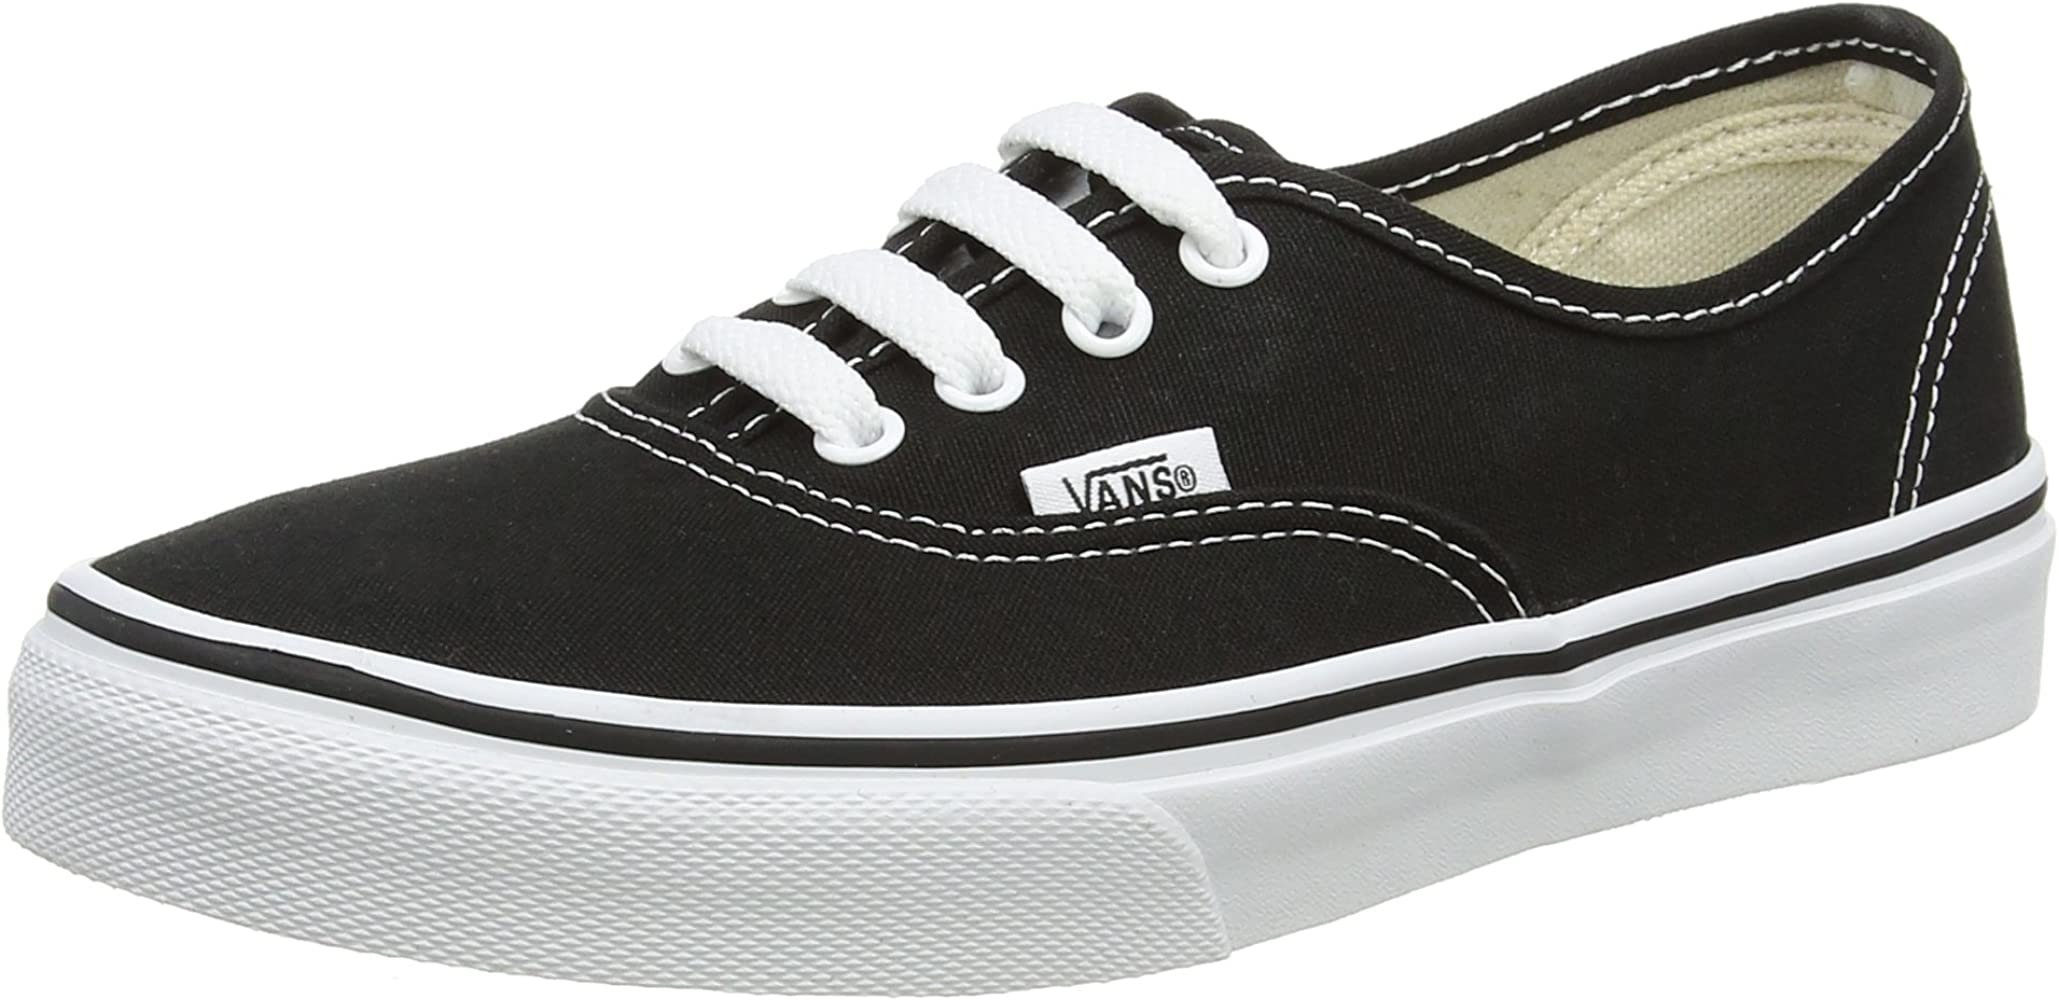 Vans Kids Black \u0026 True White